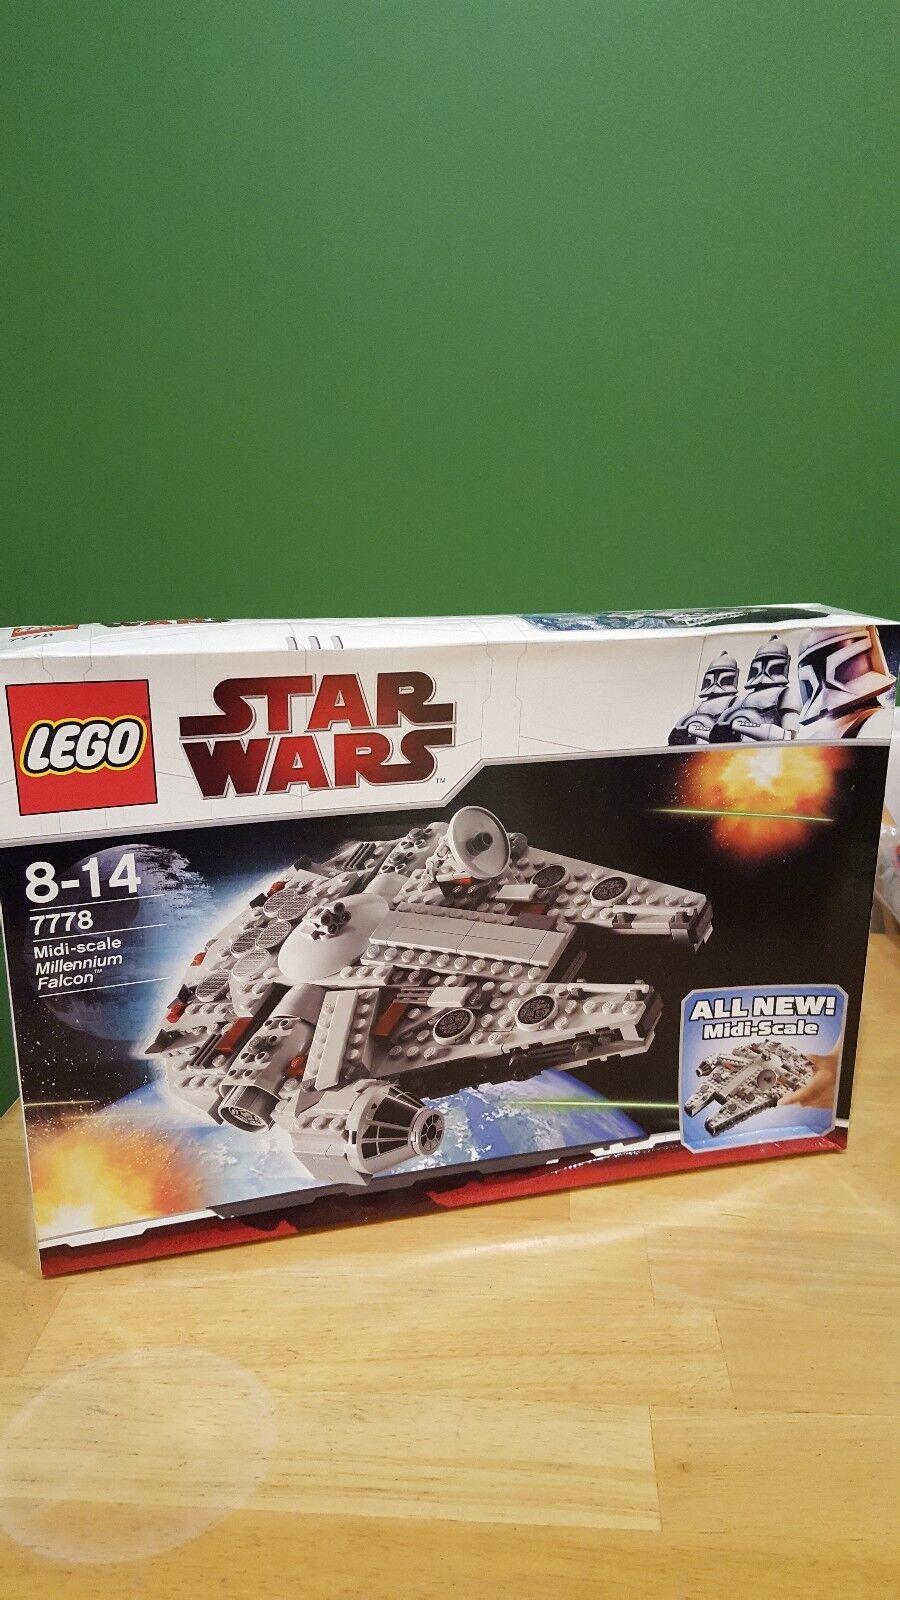 LEGO Star Wars Midi-scale Millennium Falcon (SWLGMSMF)set 7778.Very hard to find